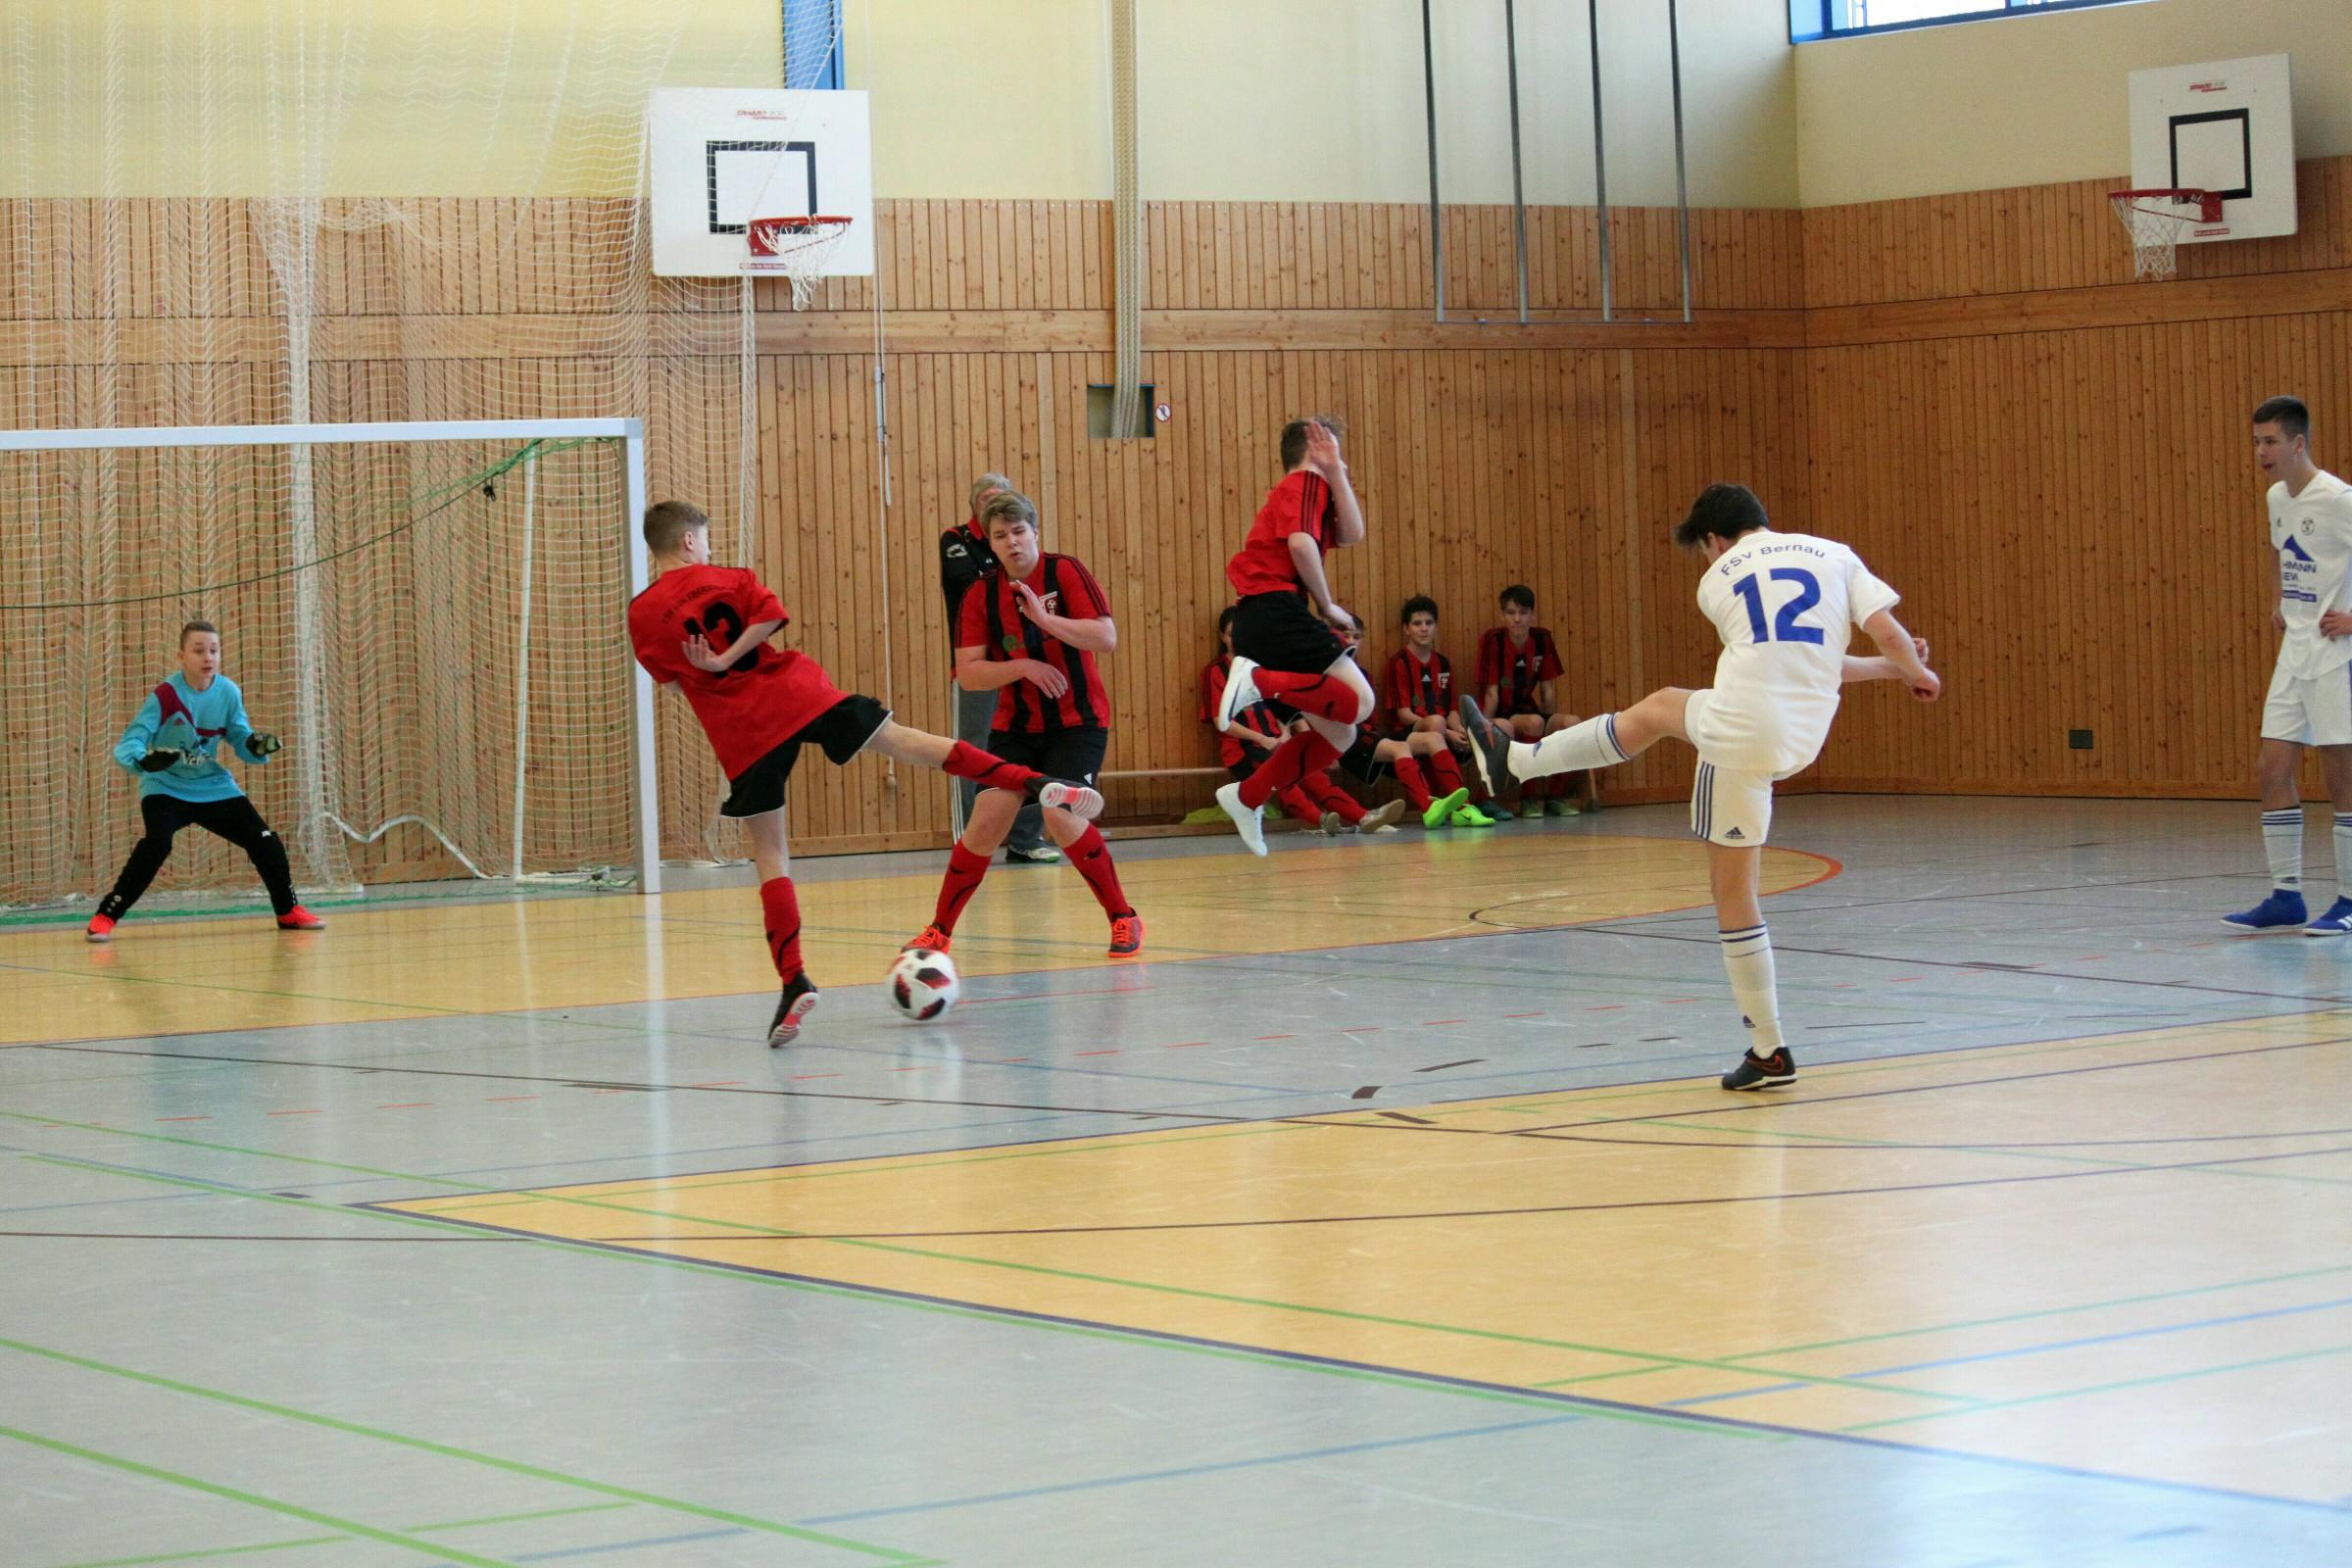 20190217 3. Wandlitzer Hallen-Cup der C-Junioren  (1)